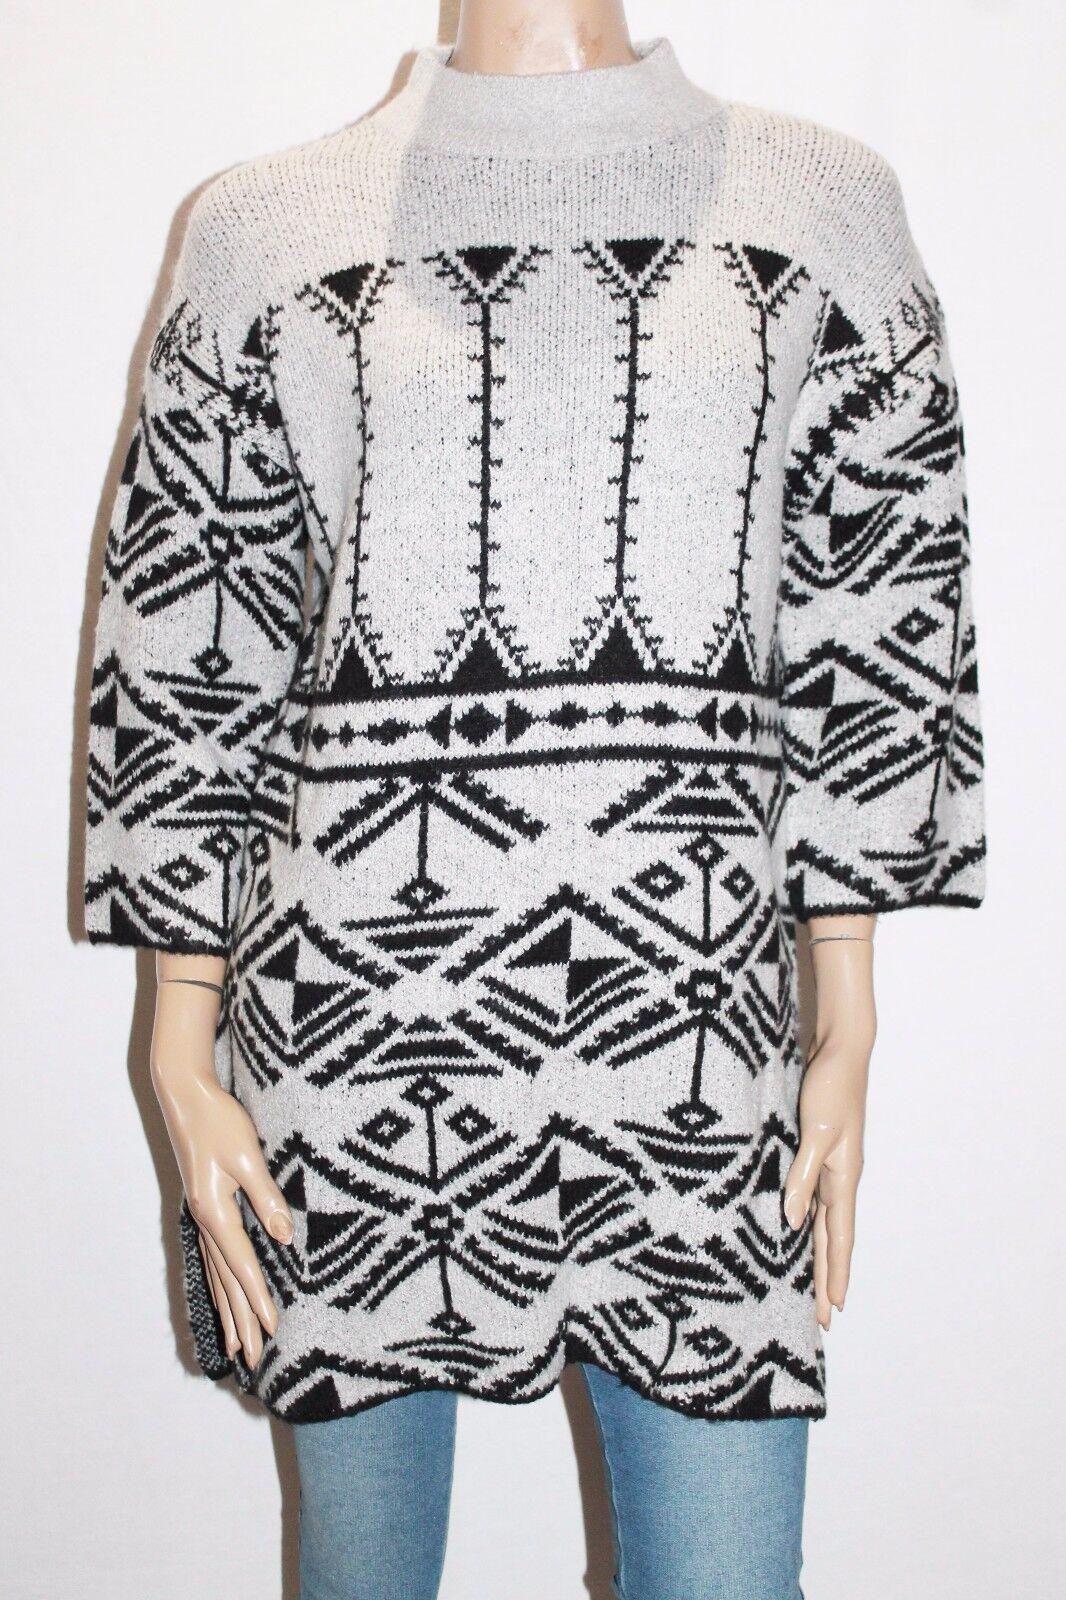 VILA Brand Light Grey Kntted Short Sleeve Jumper Size XS BNWT  SL76